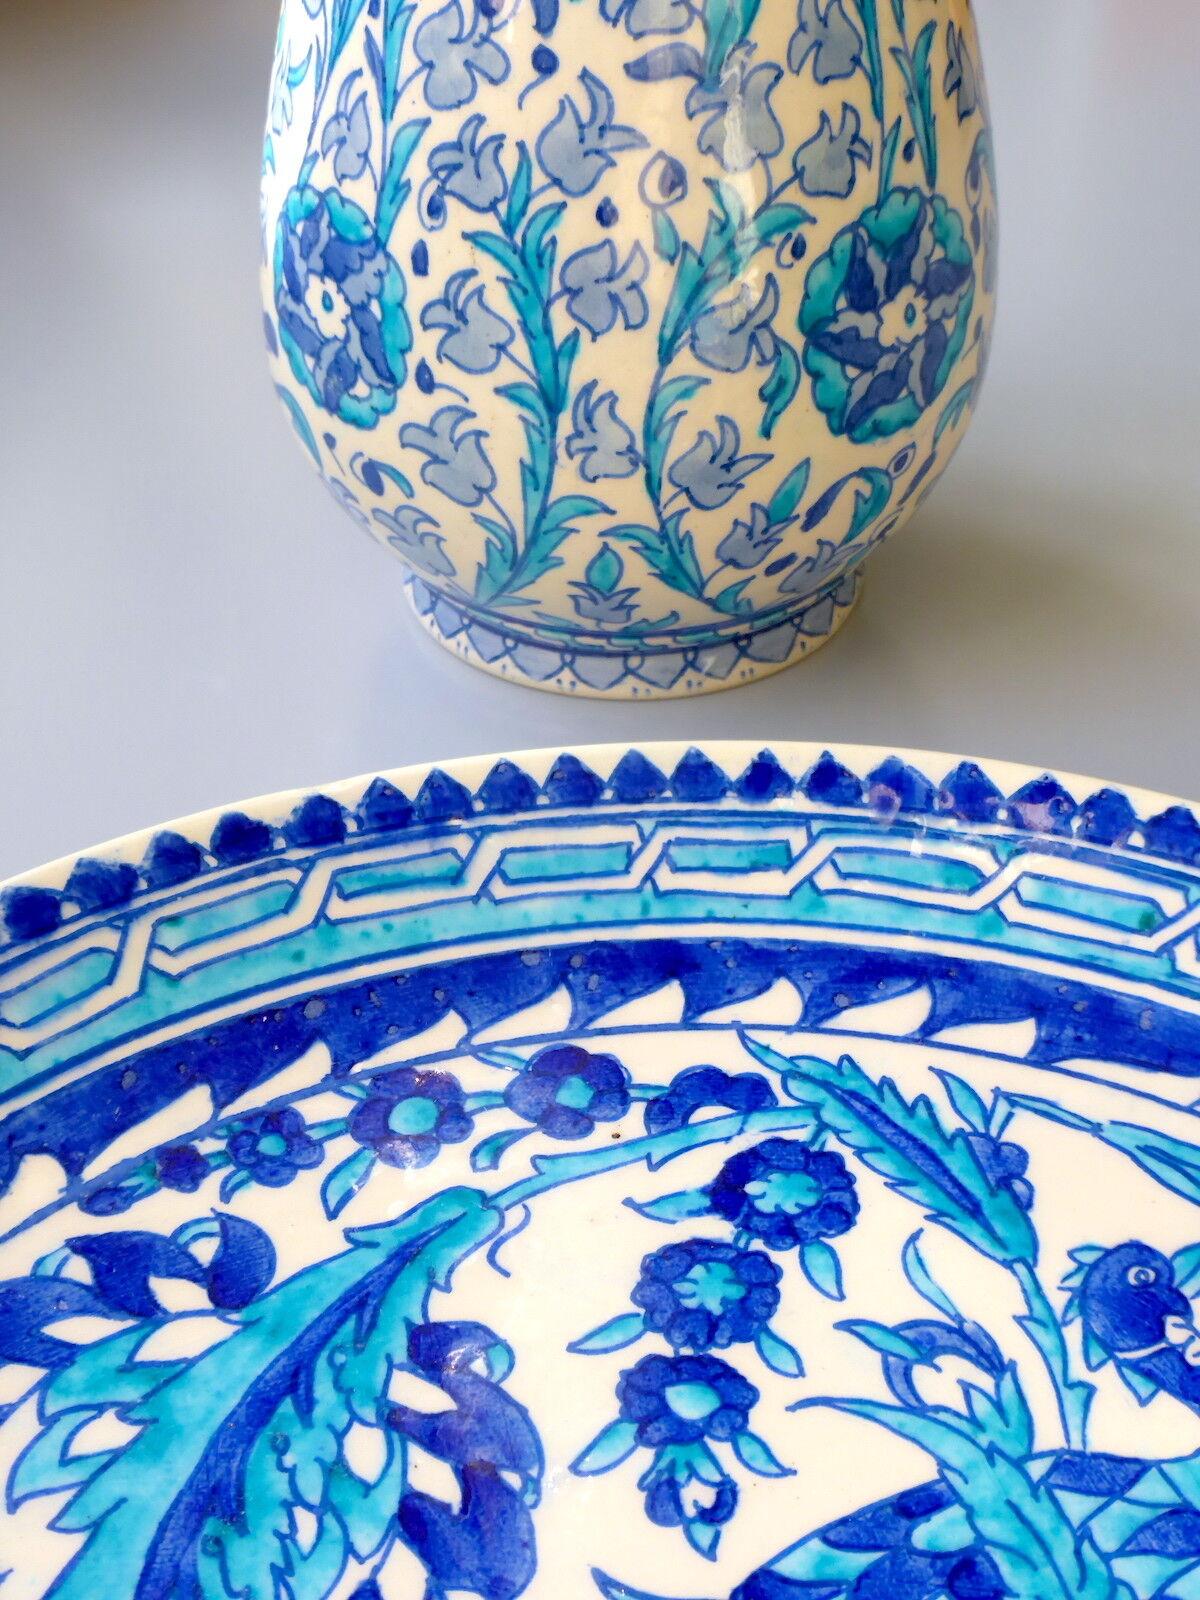 KÜTAHYA Vase + Teller - I. Çelebi Çini, Ton Keramik Türkisches Kunsthandwerk